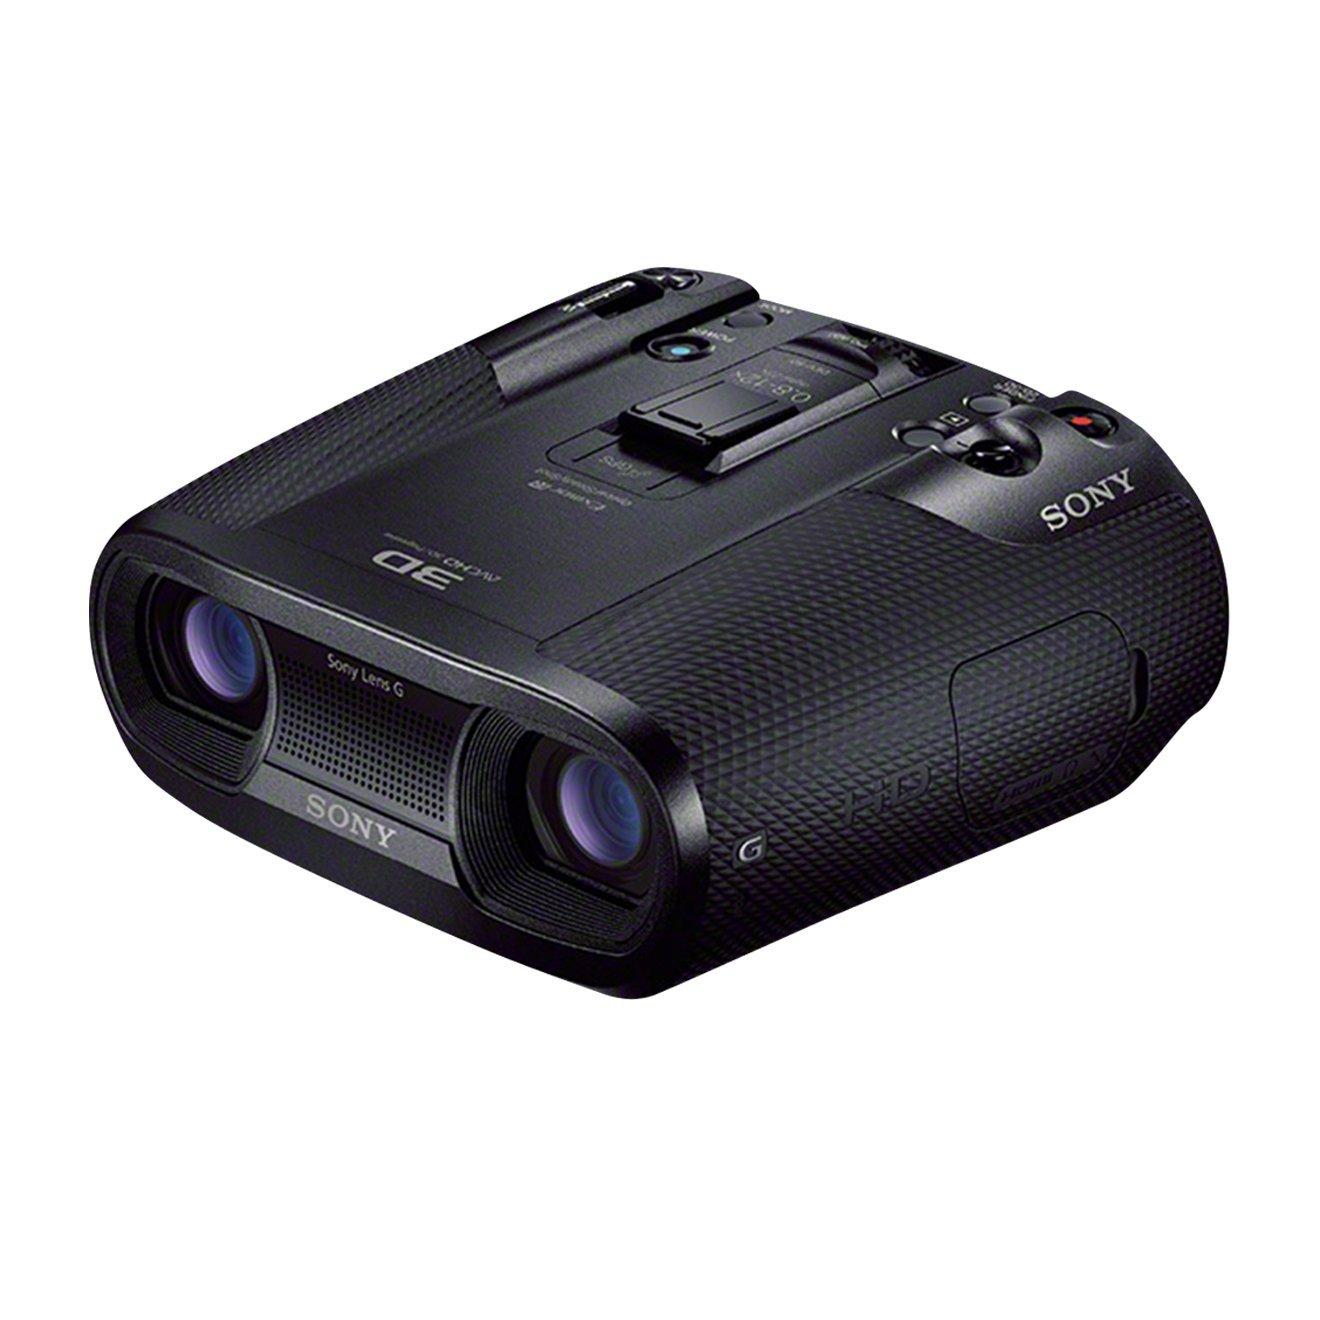 Sony DEV-50V B00D1AL0KU